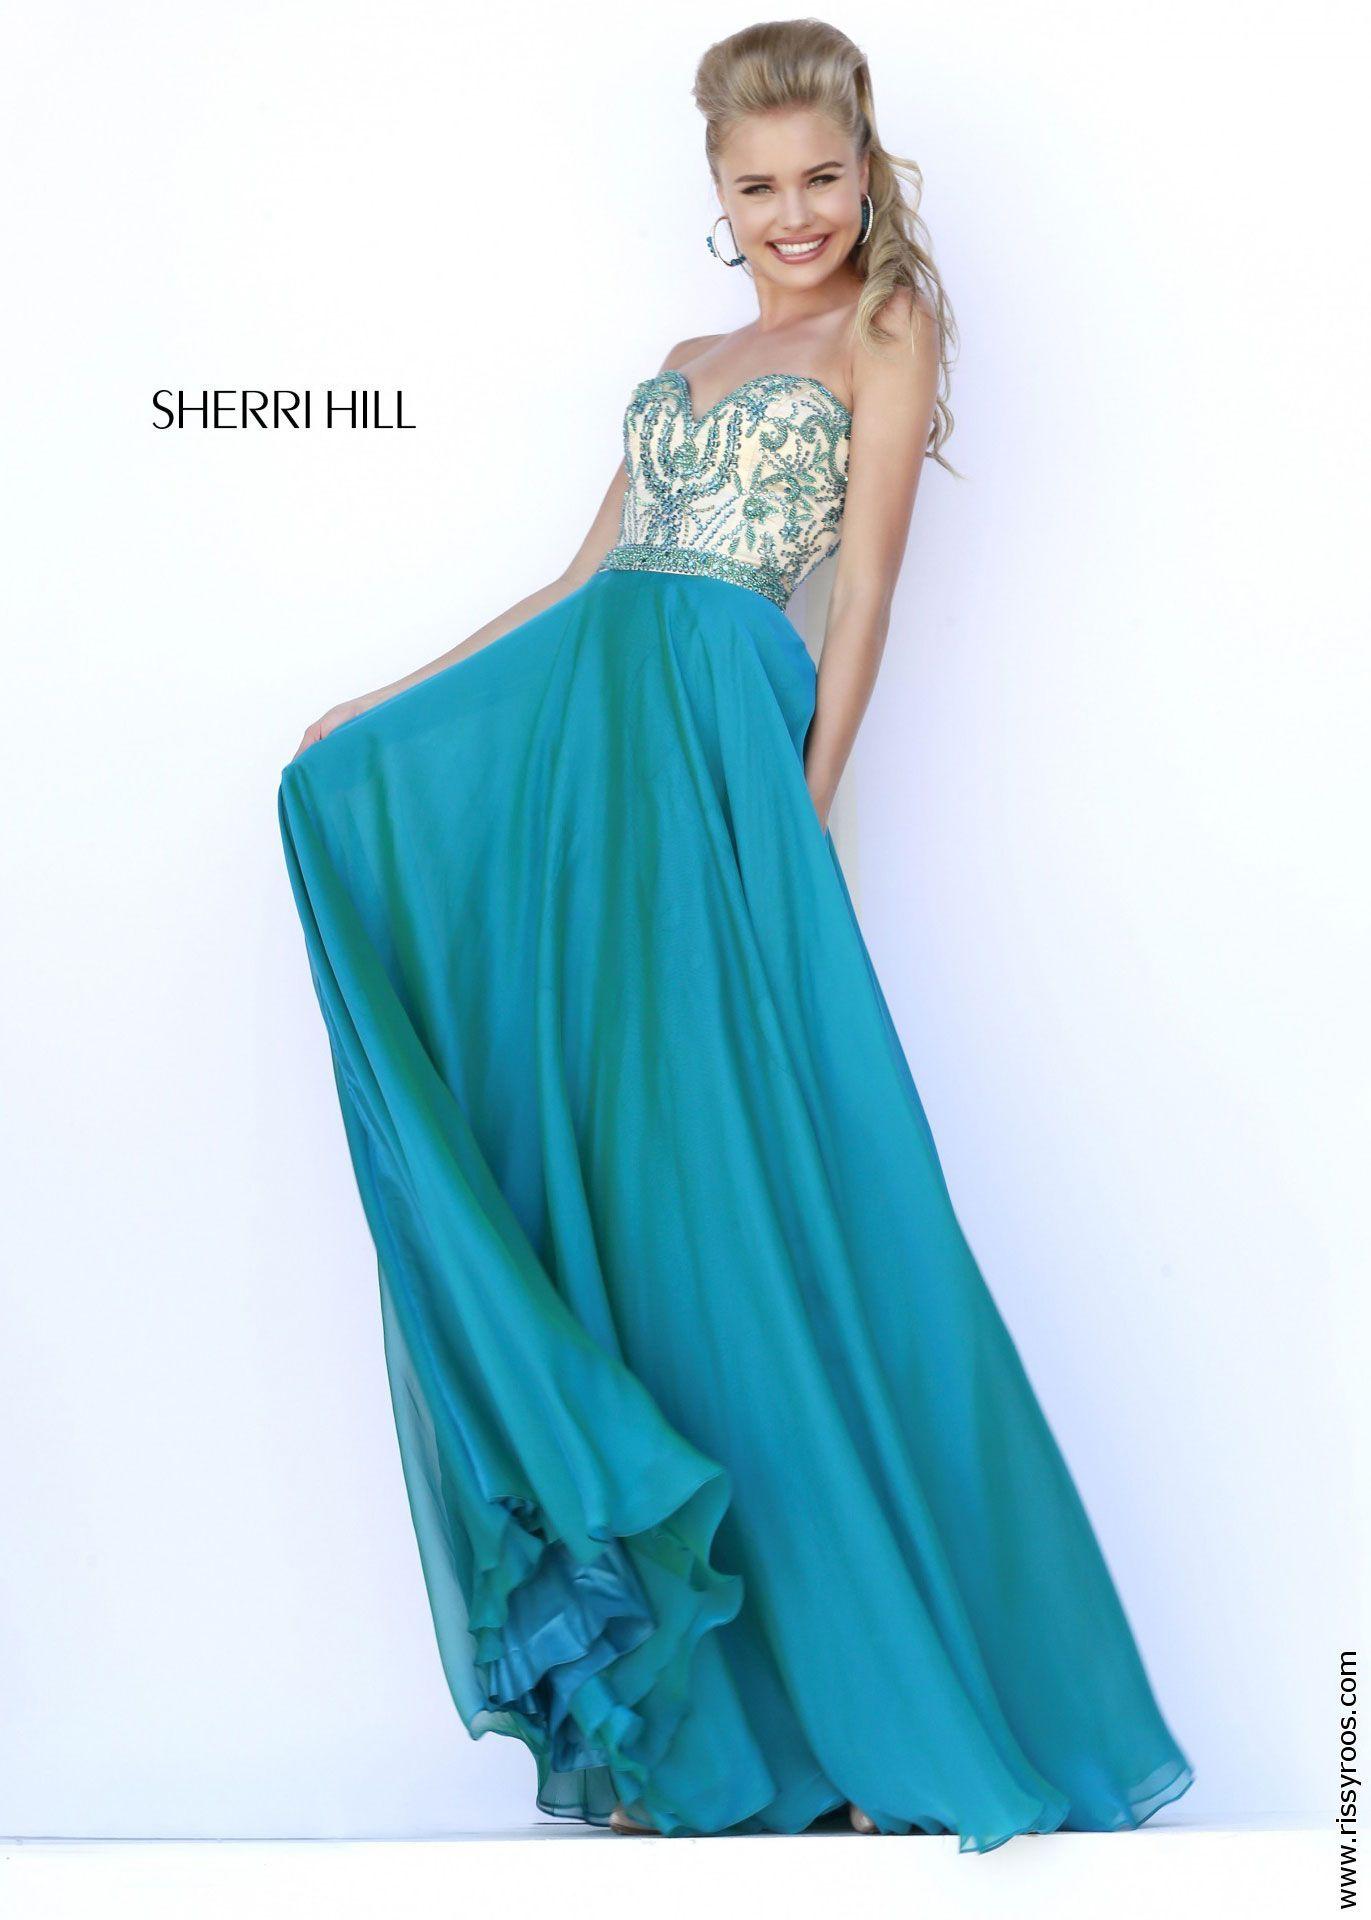 Sherri Hill 1947 Flirty Chiffon Gown | clothes | Pinterest | Chiffon ...